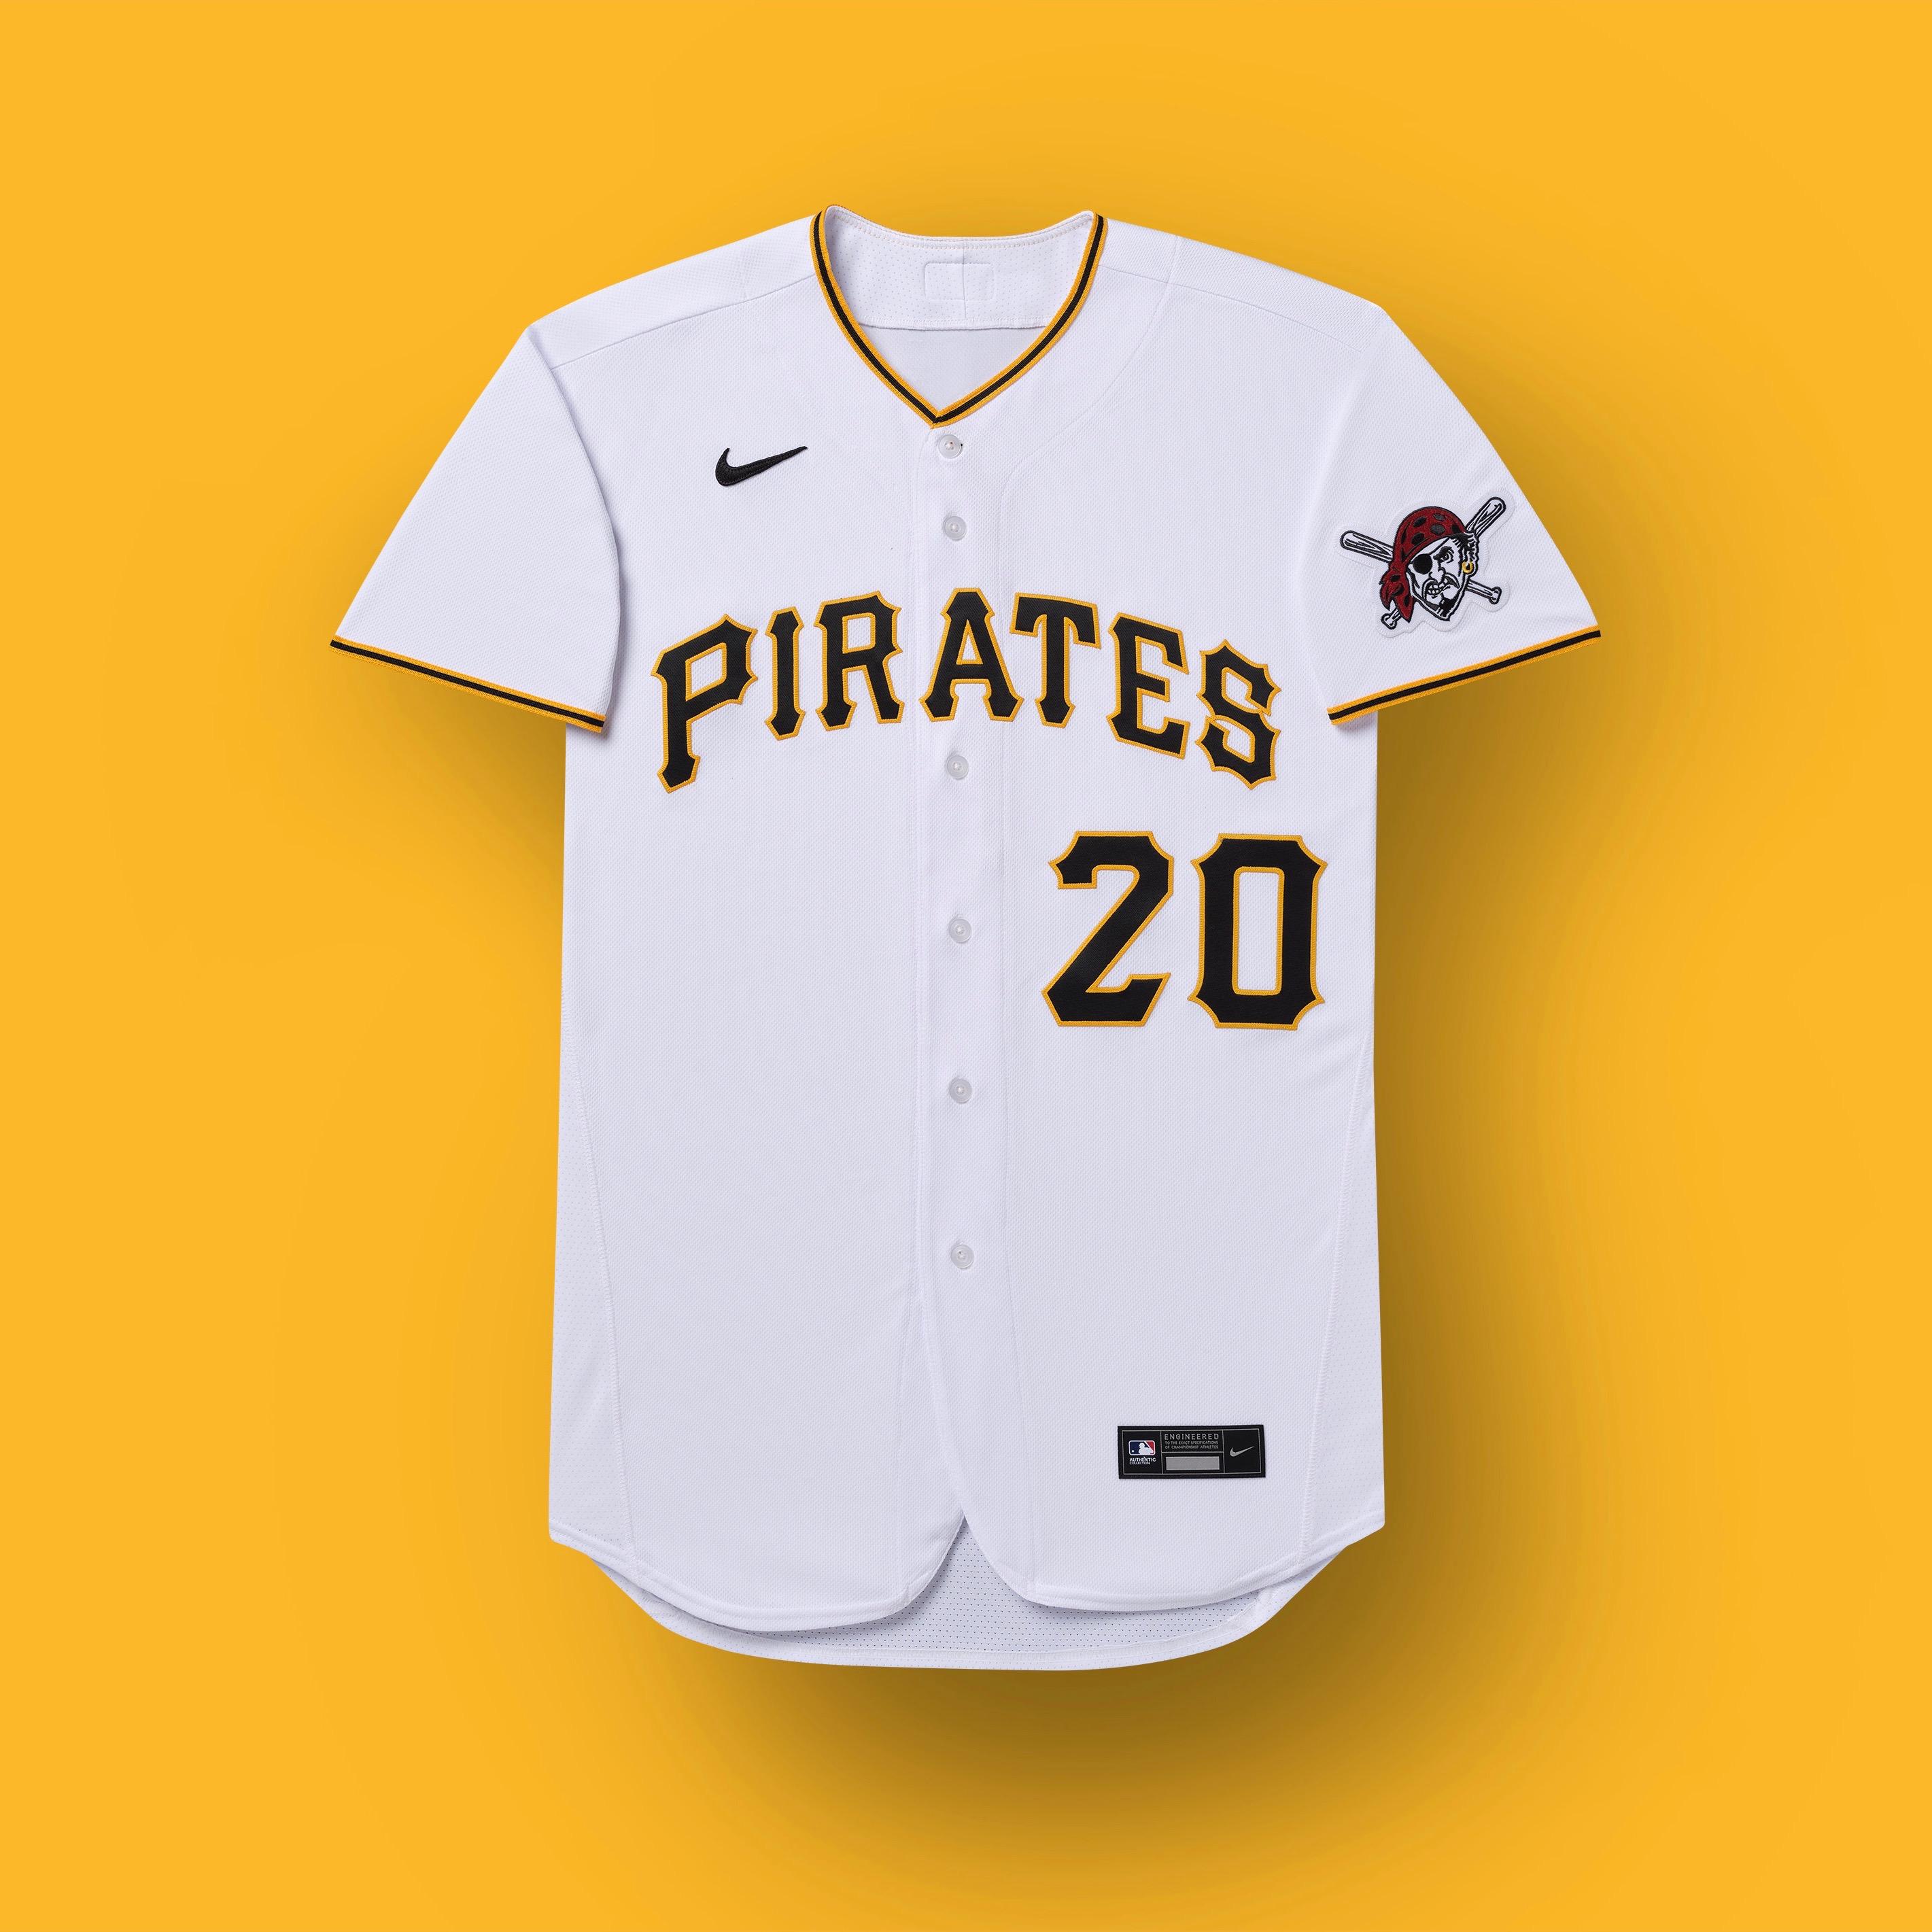 pittsburgh pirates 2020 uniform